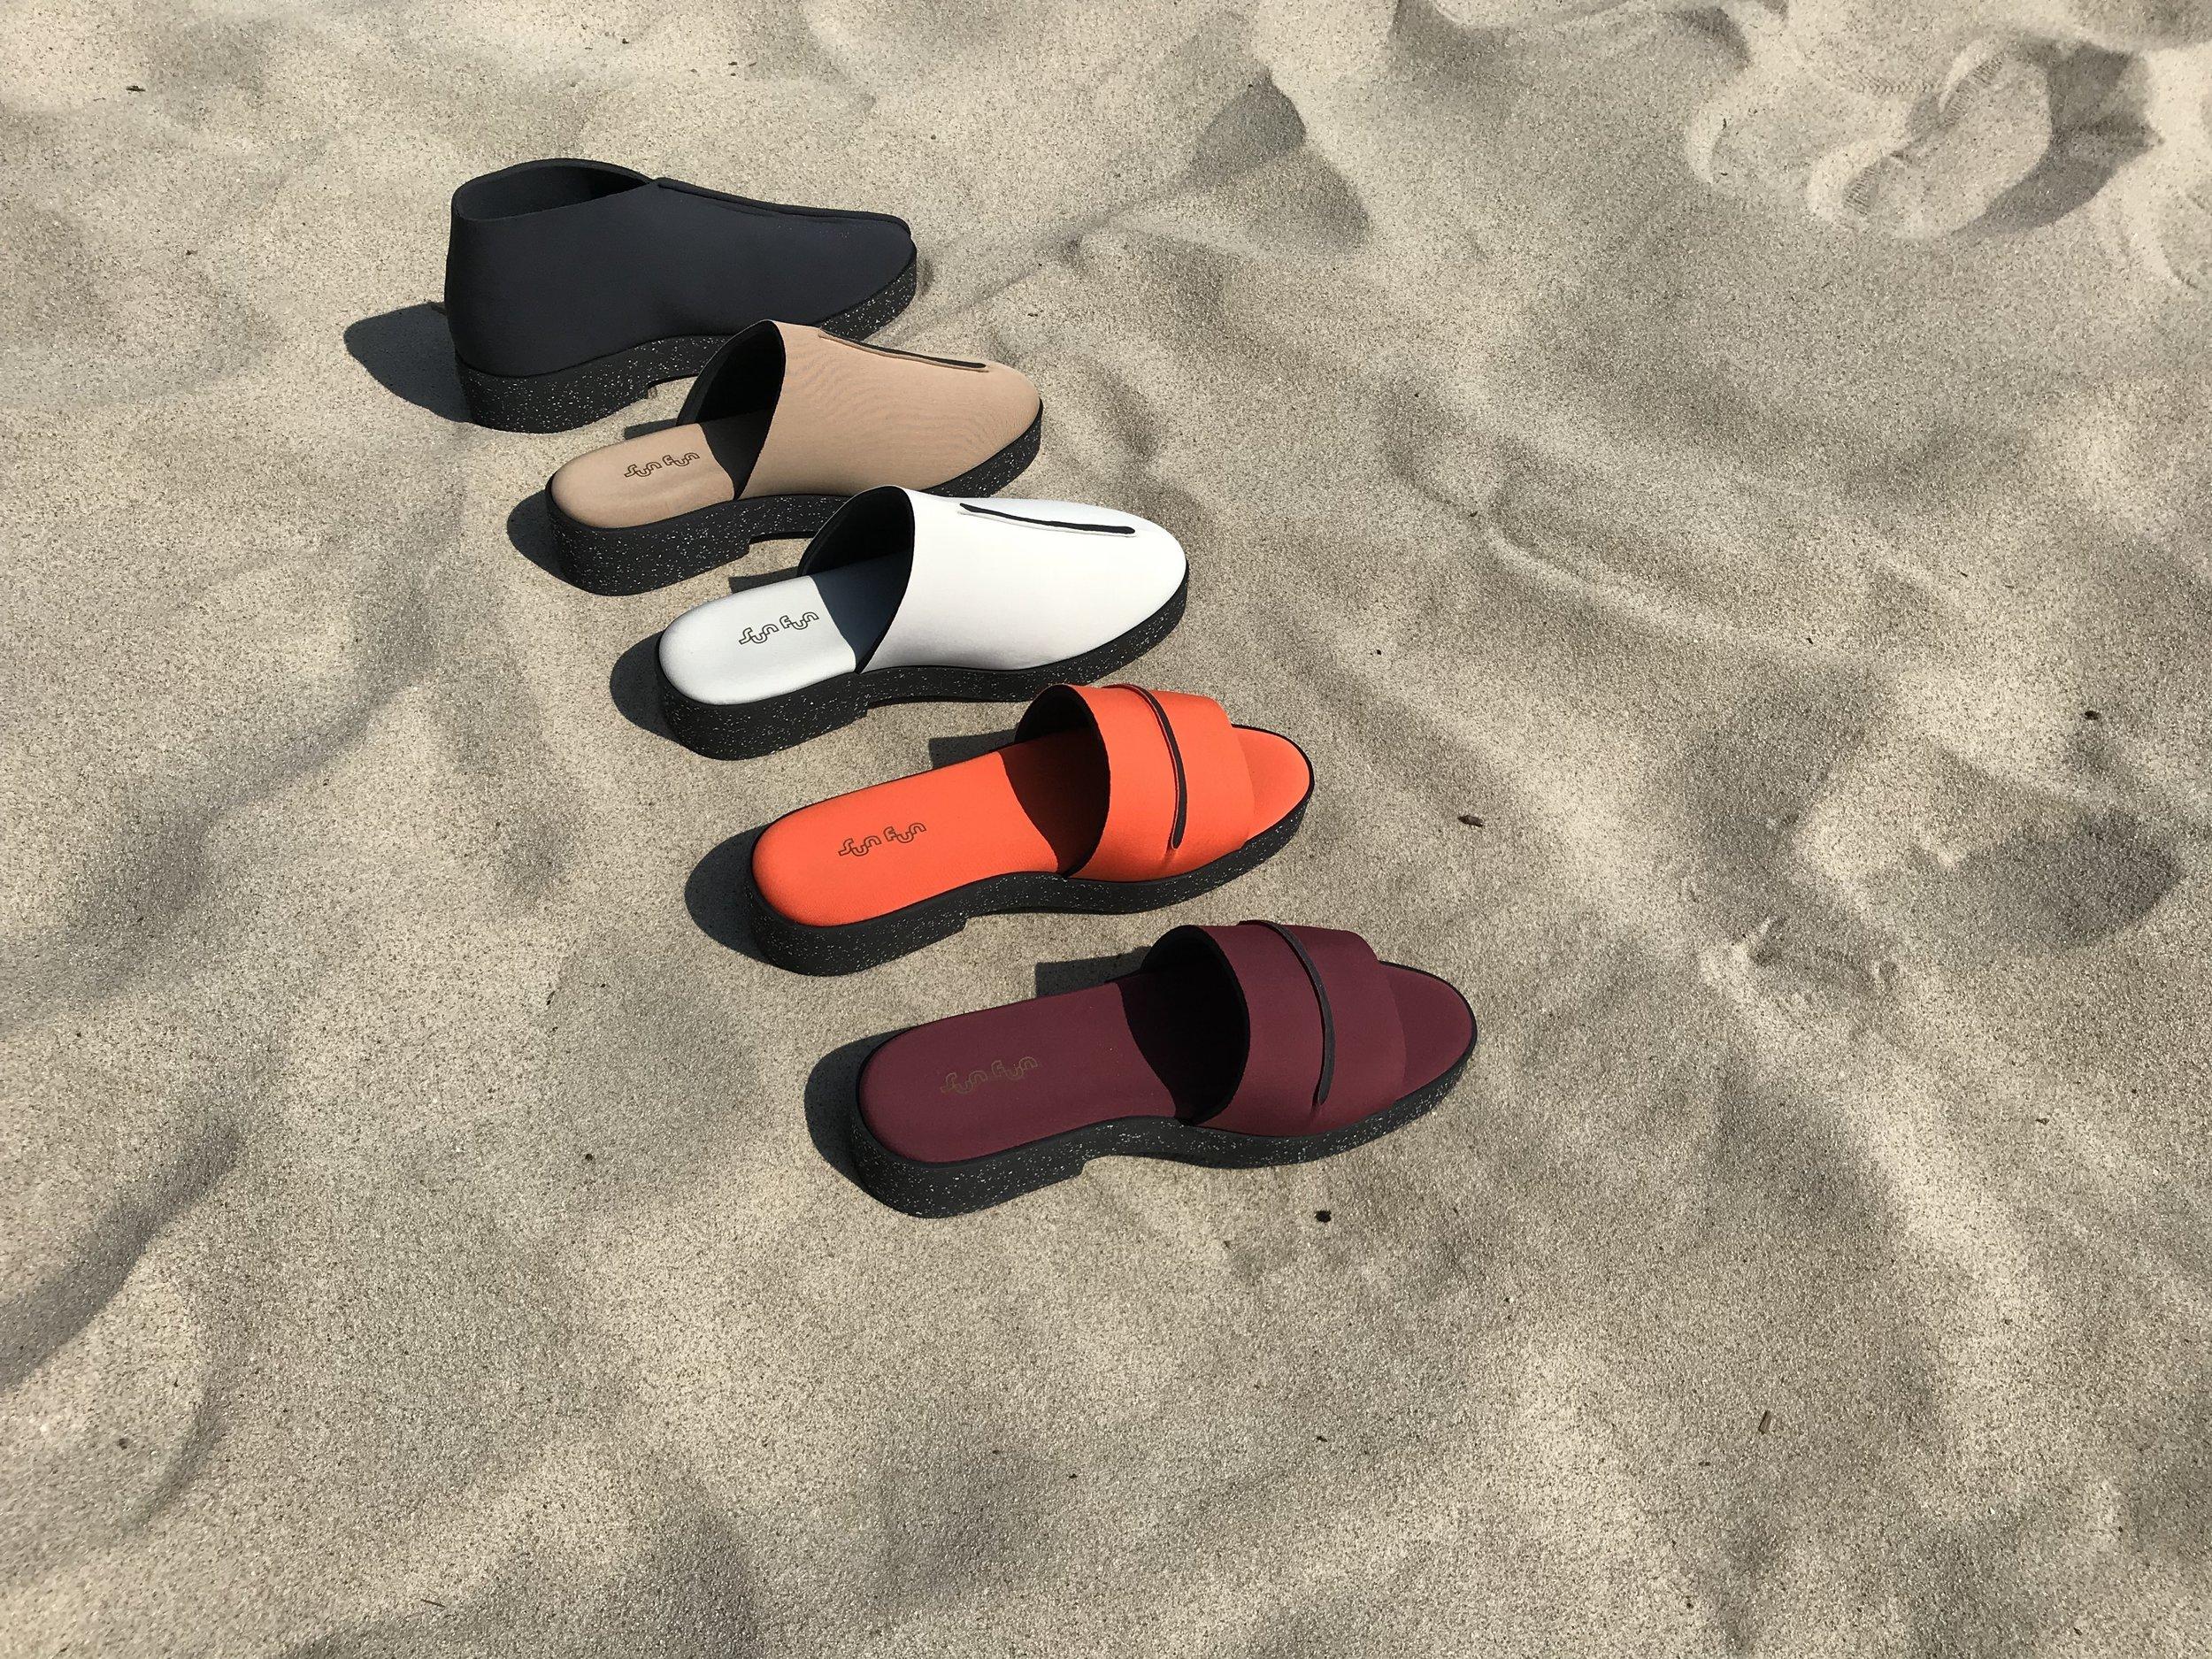 Susan Rosenberg sun fun fashion moda shoes werule we rule